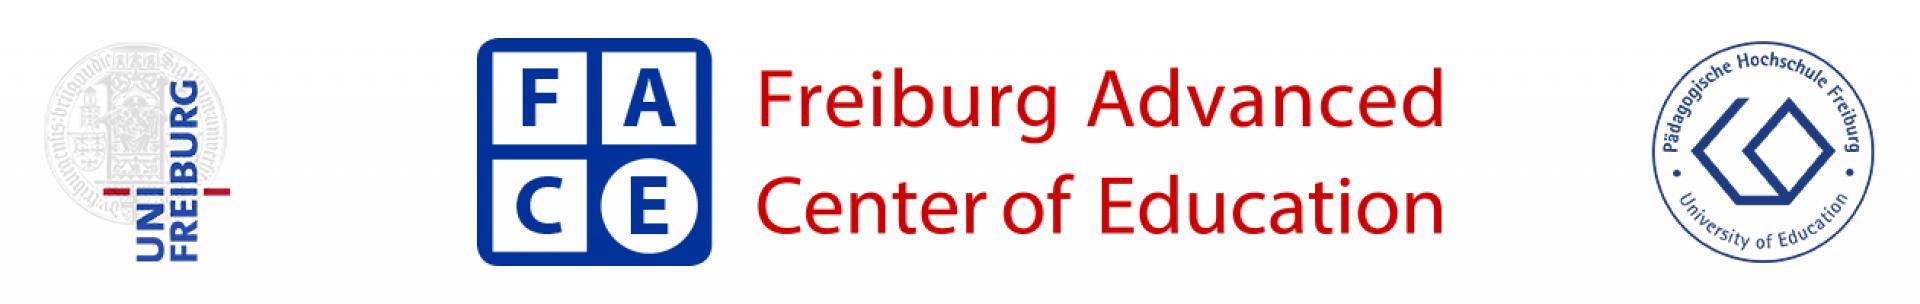 Freiburg Advanced Center of Education